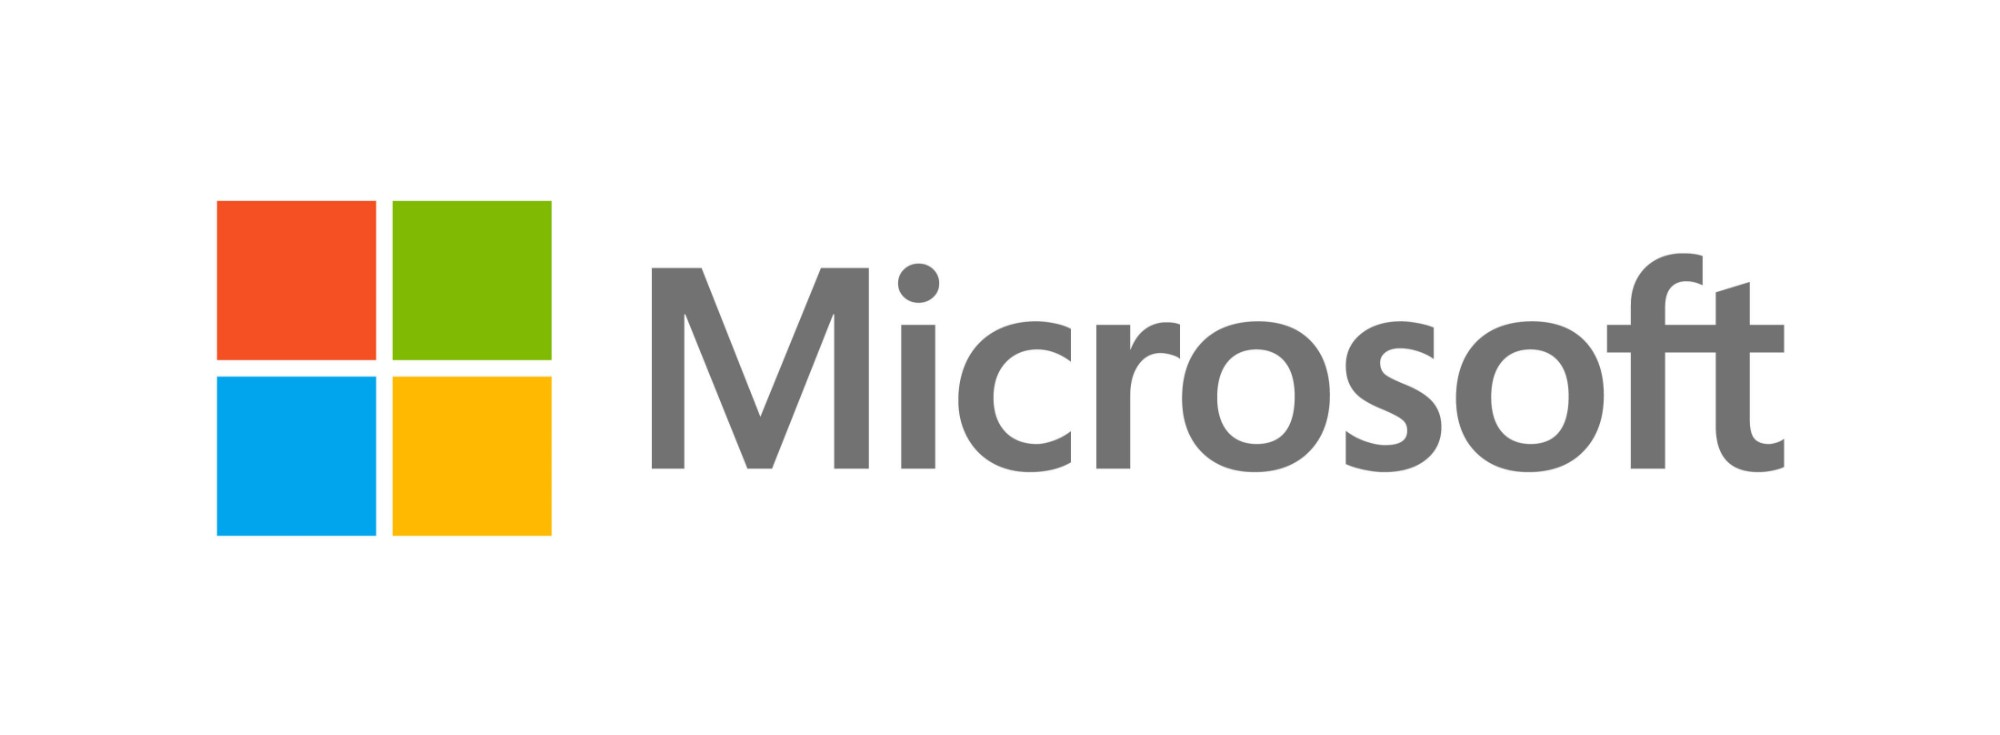 Microsoft 365 Family 1 year(s) English